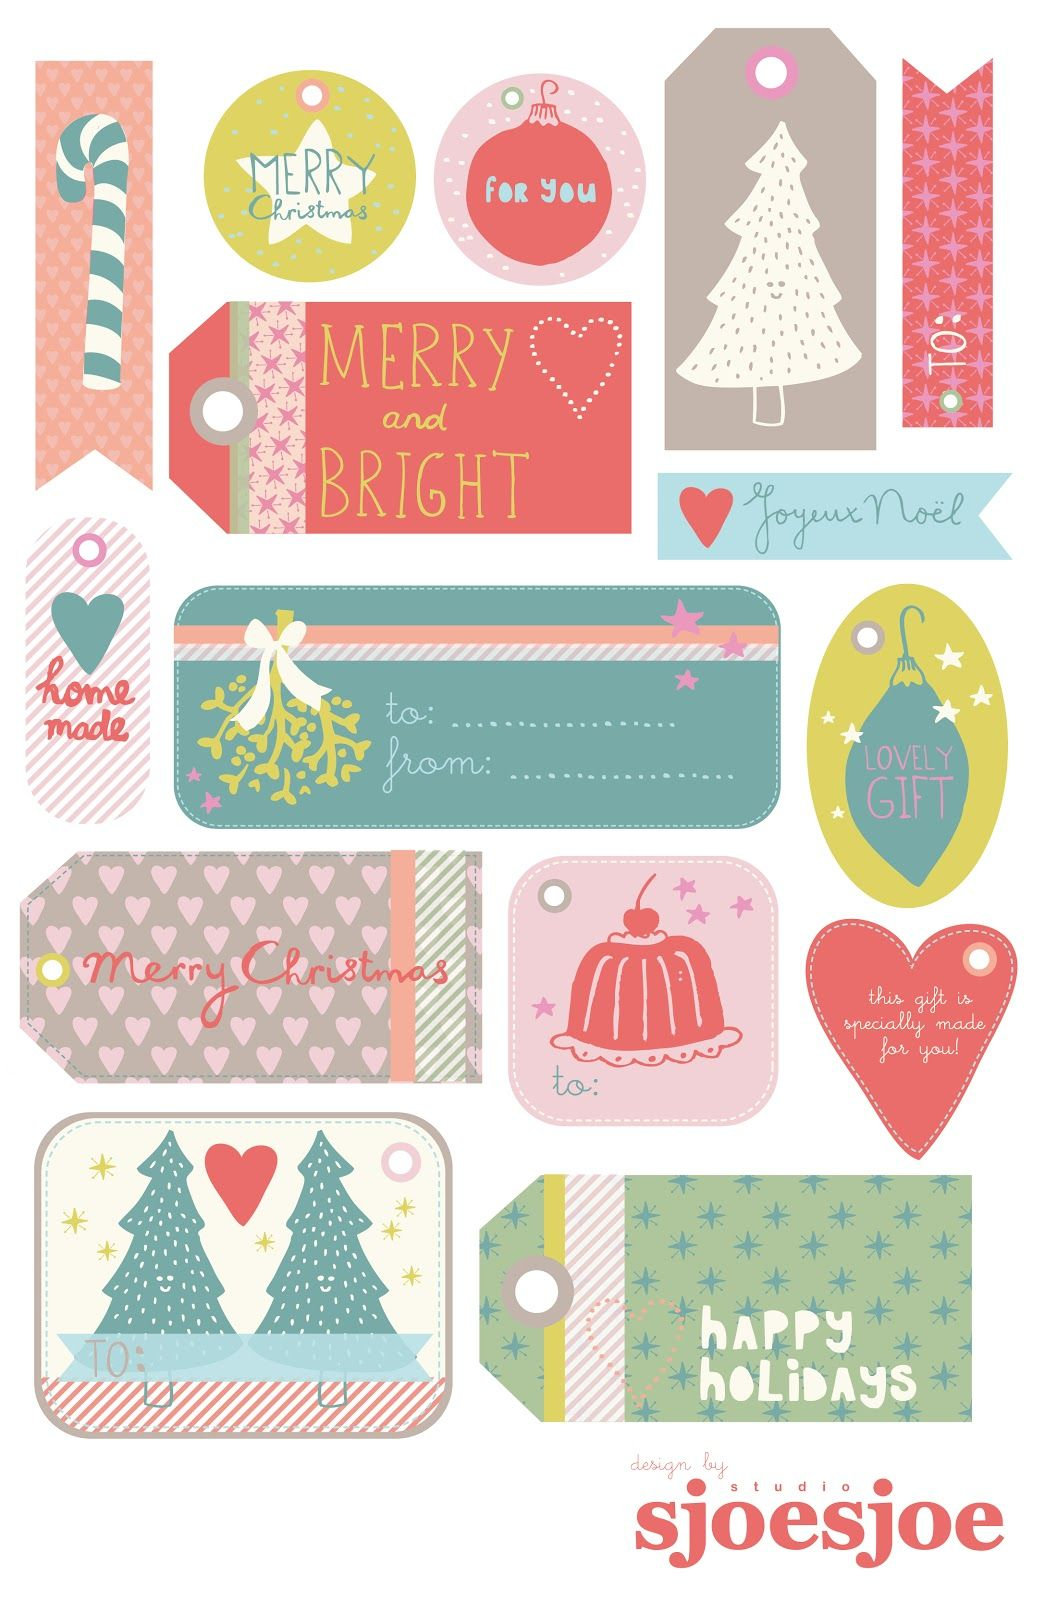 Free Printable Christmas Gift Tags By Studio Sjoesjoe Scrapbooking